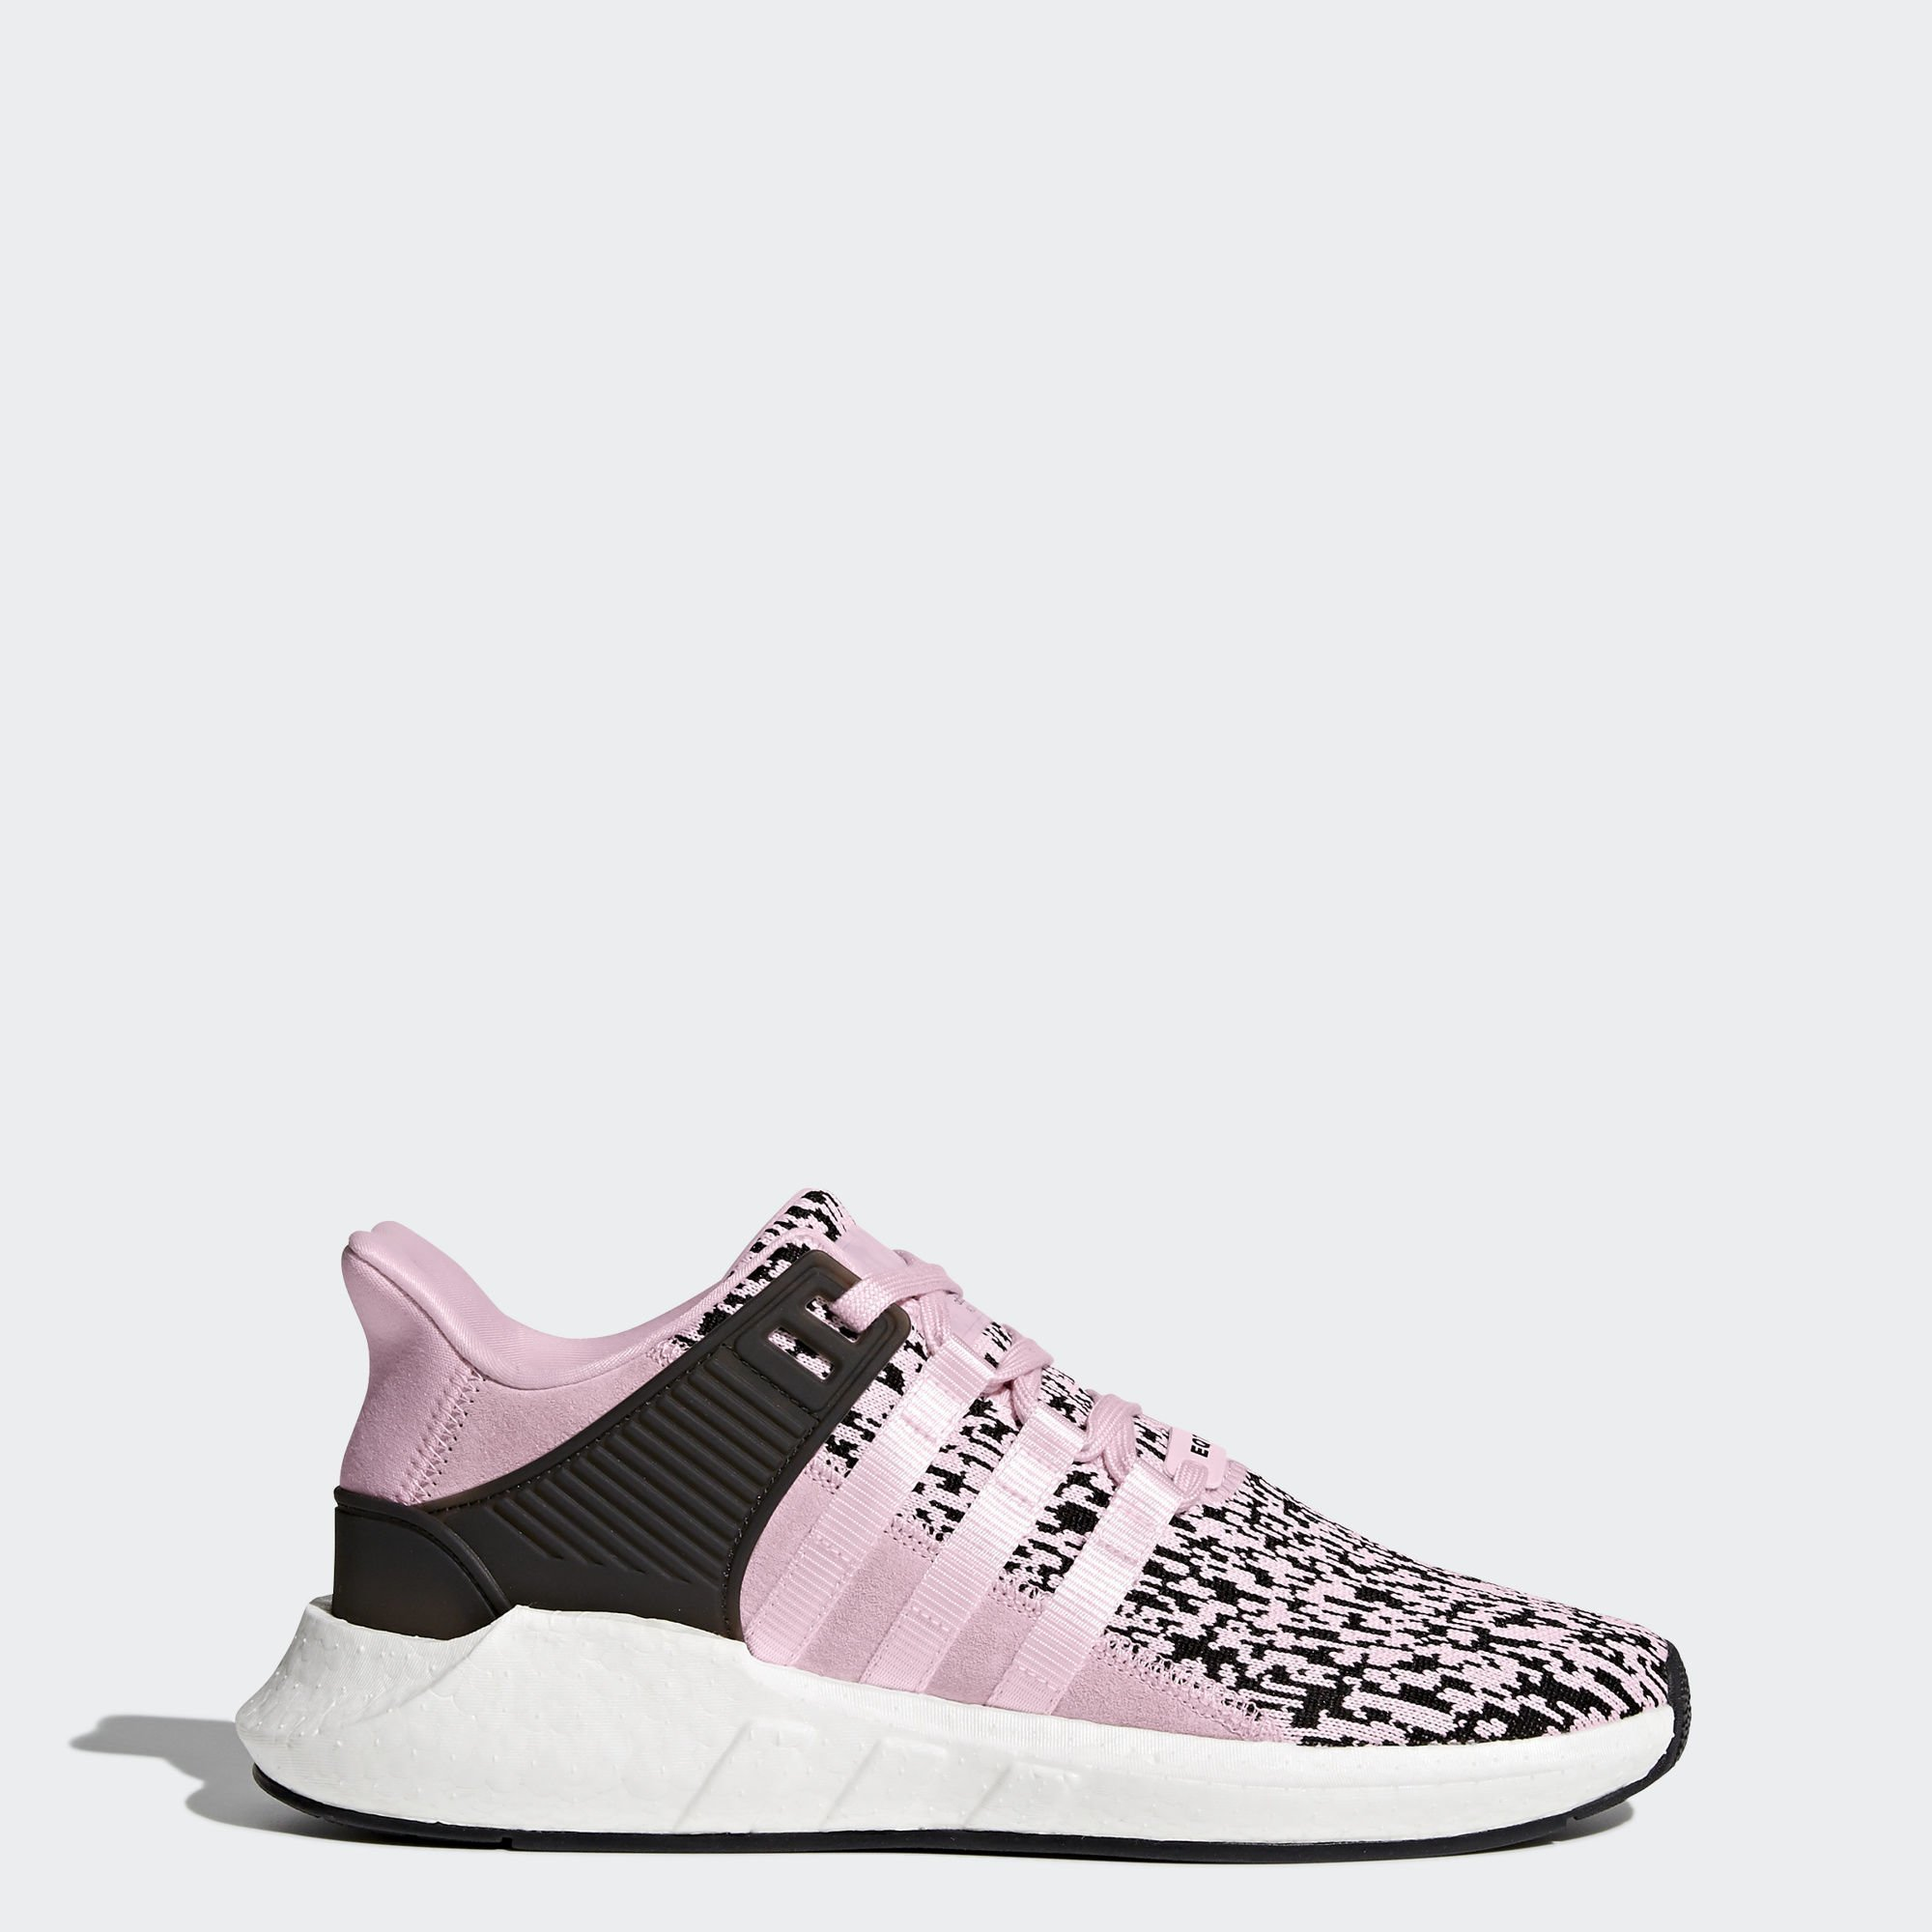 Adidas EQT Support 93/17 BZ0583